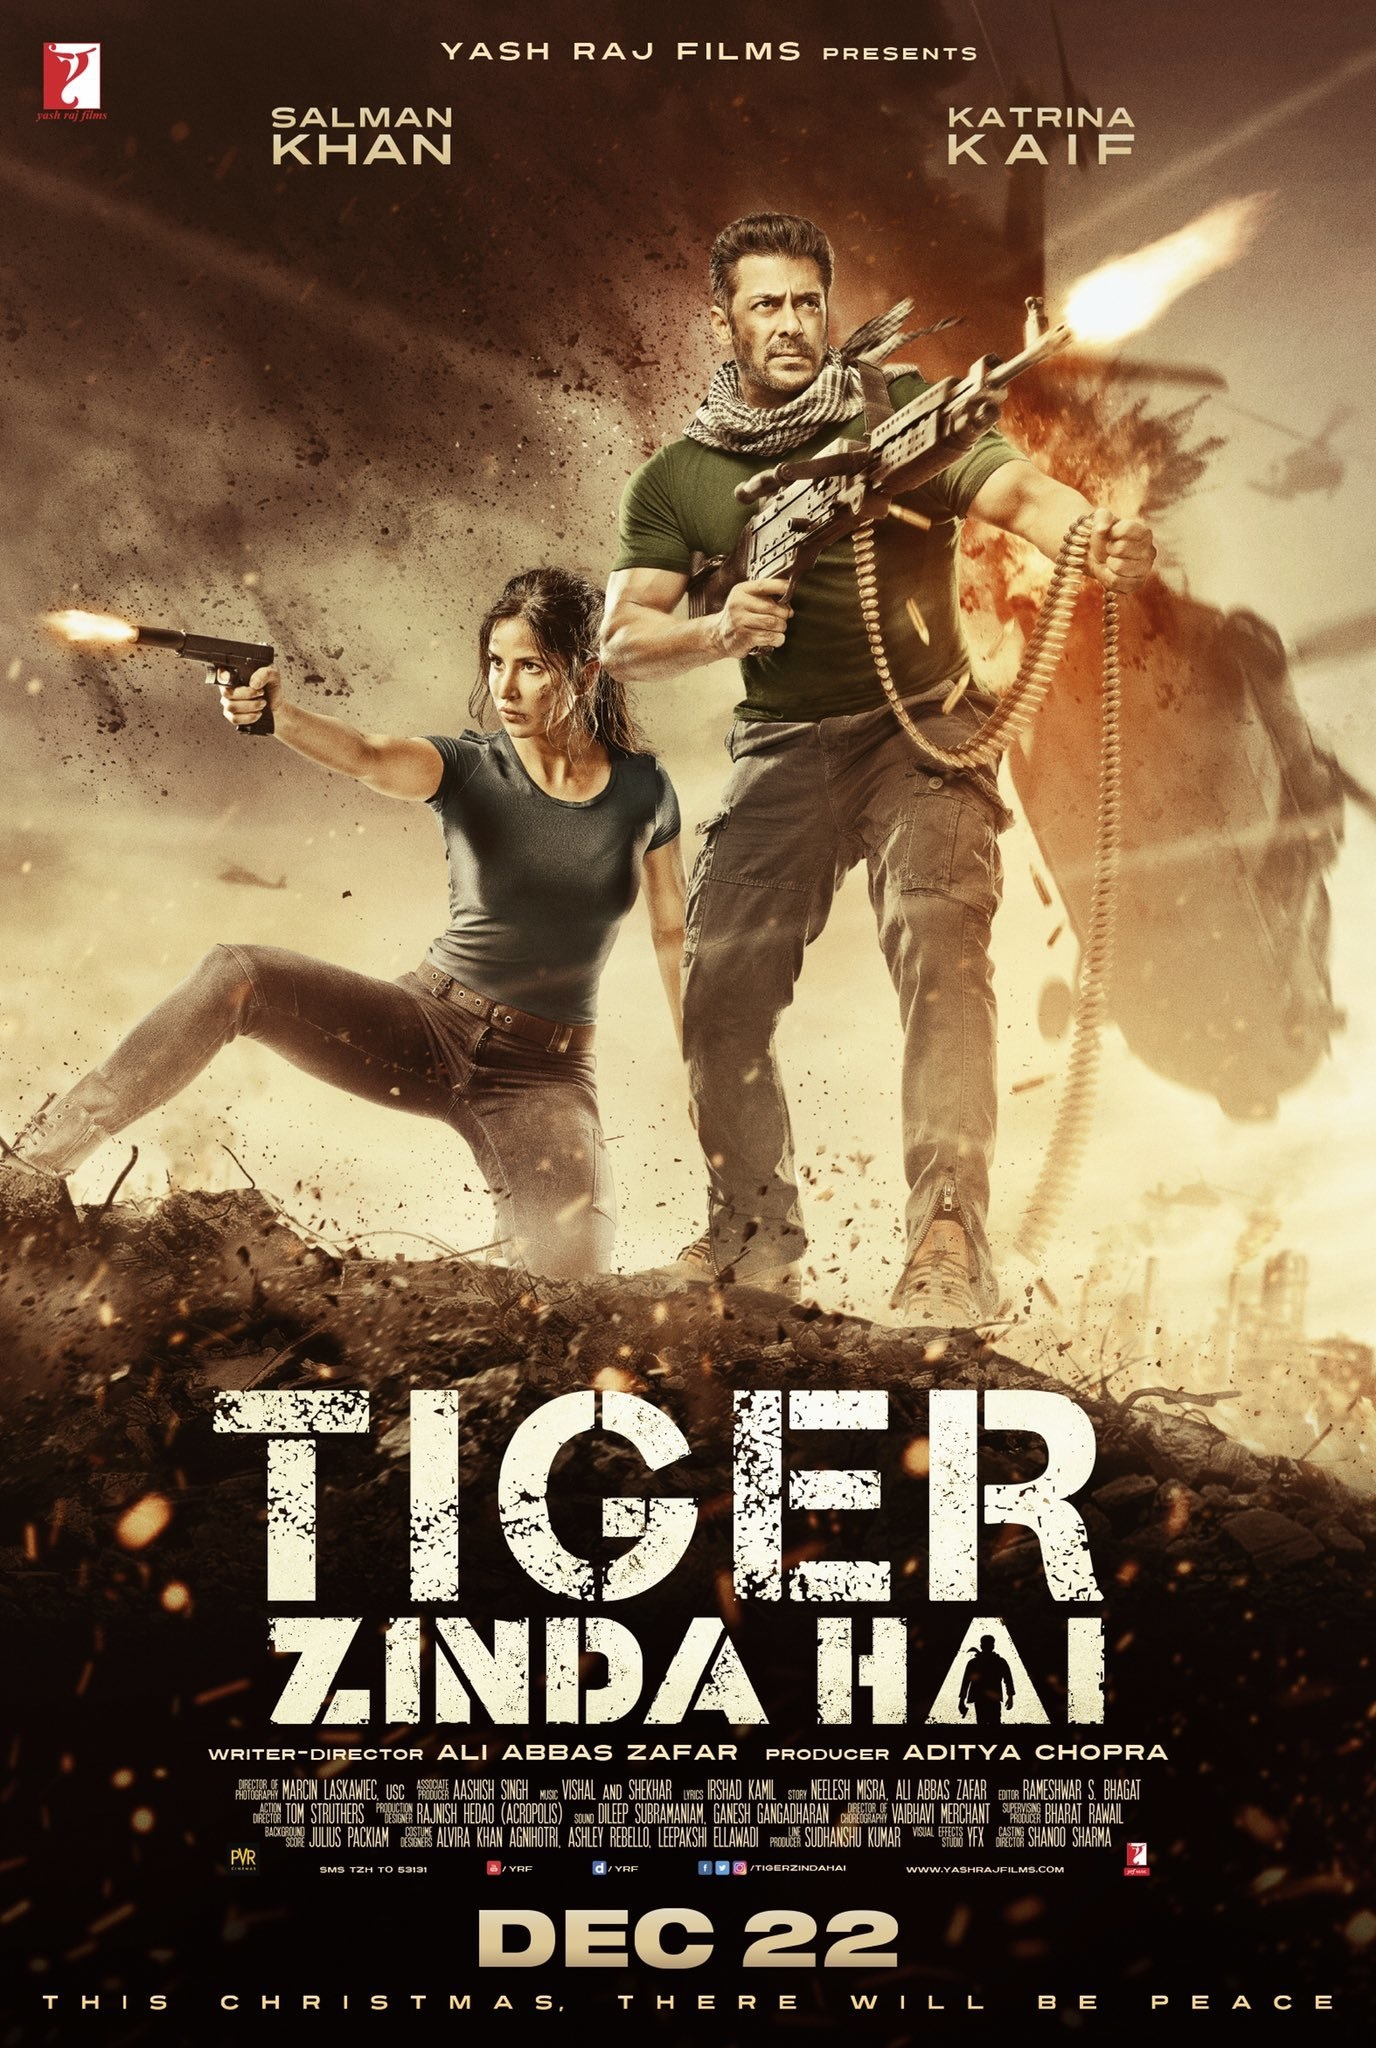 Tiger Zinda Hai Poster - Salman Khan Katrina Kaif